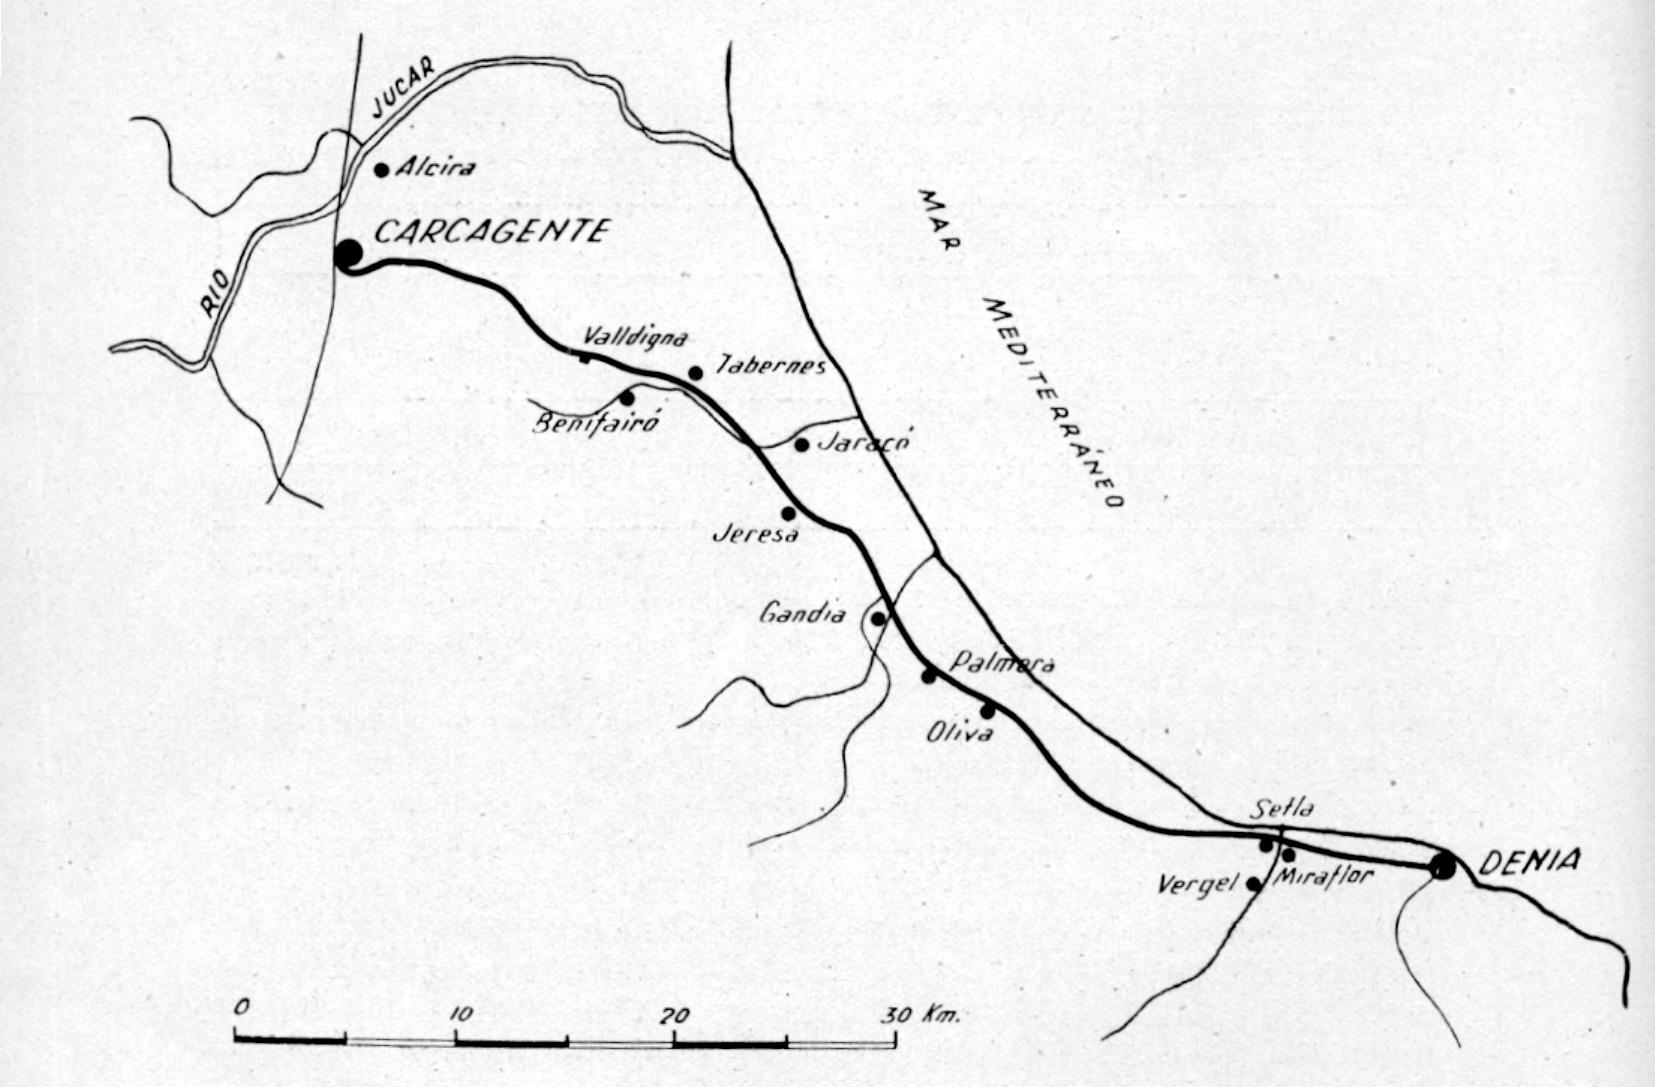 Plano del itinerario de la linea,